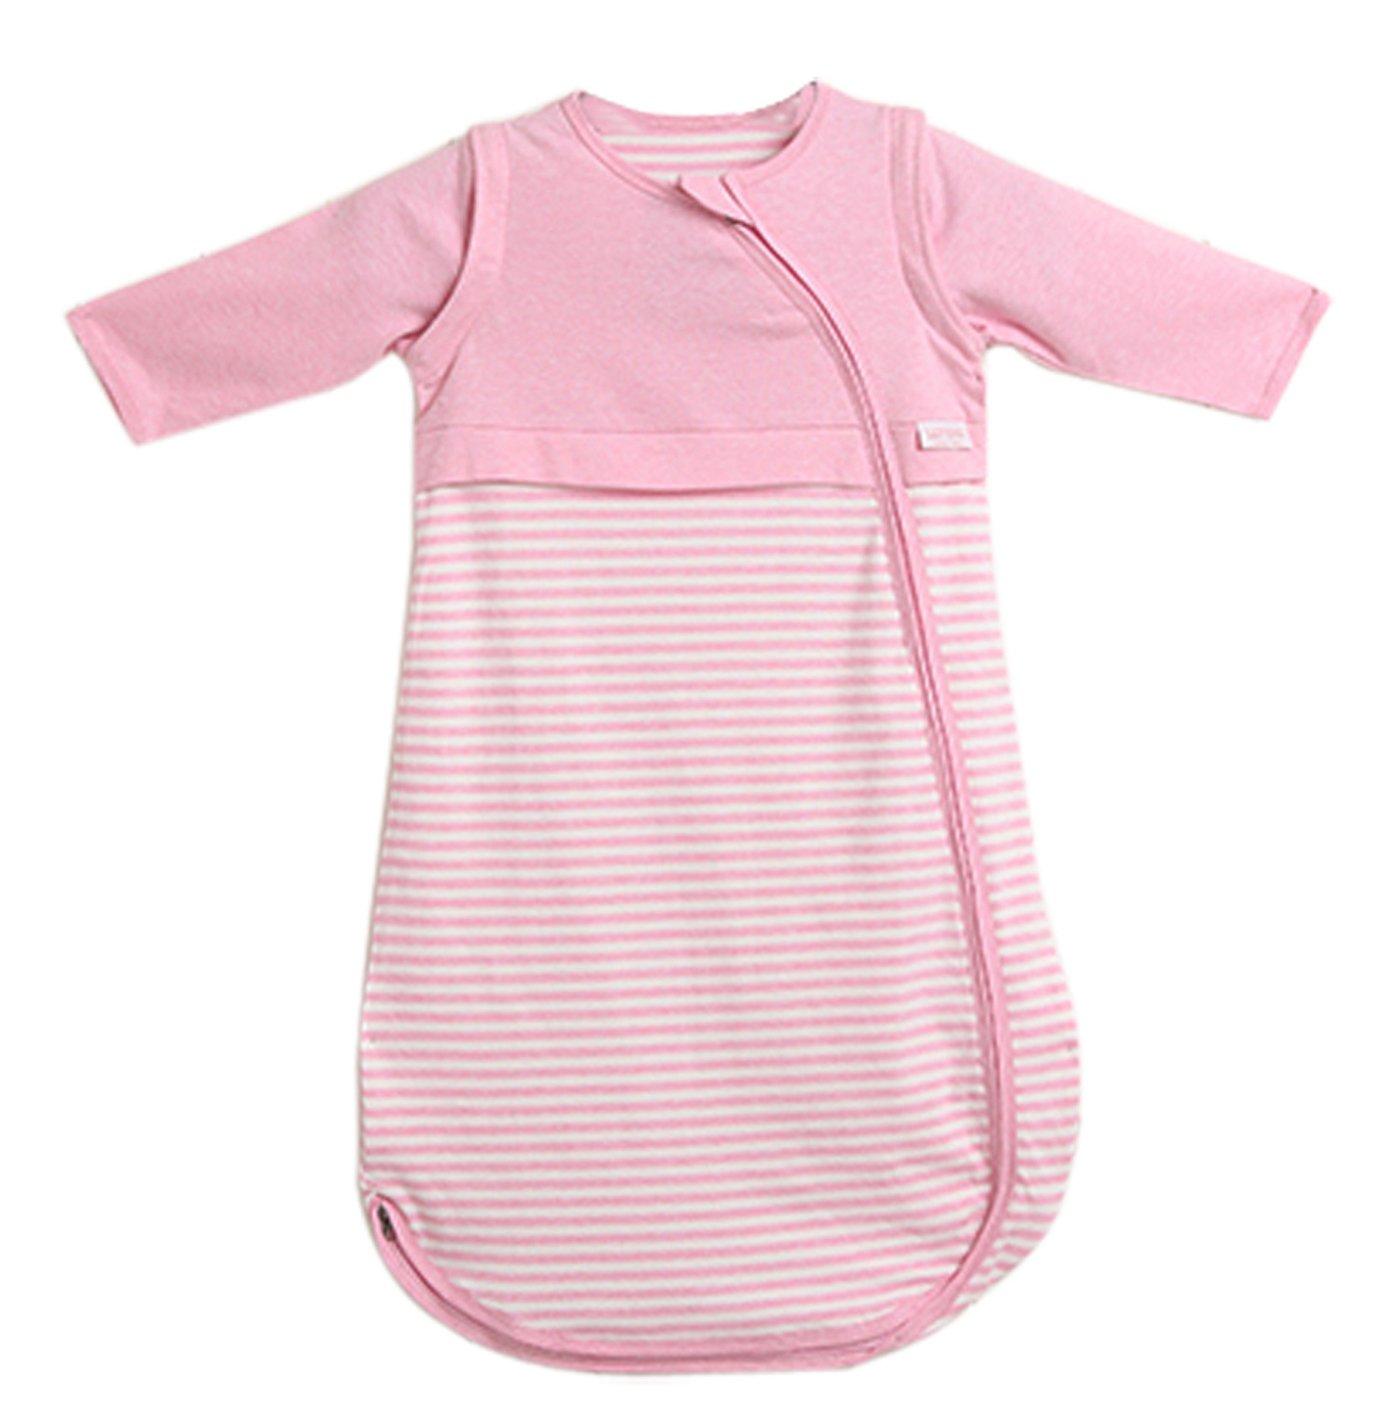 LETTAS Baby Girls 100% Cotton Stripe Removable Sleeve Sleeping Bag 0.5 Tog - Soft Wearable BlanketPink (2-3T)